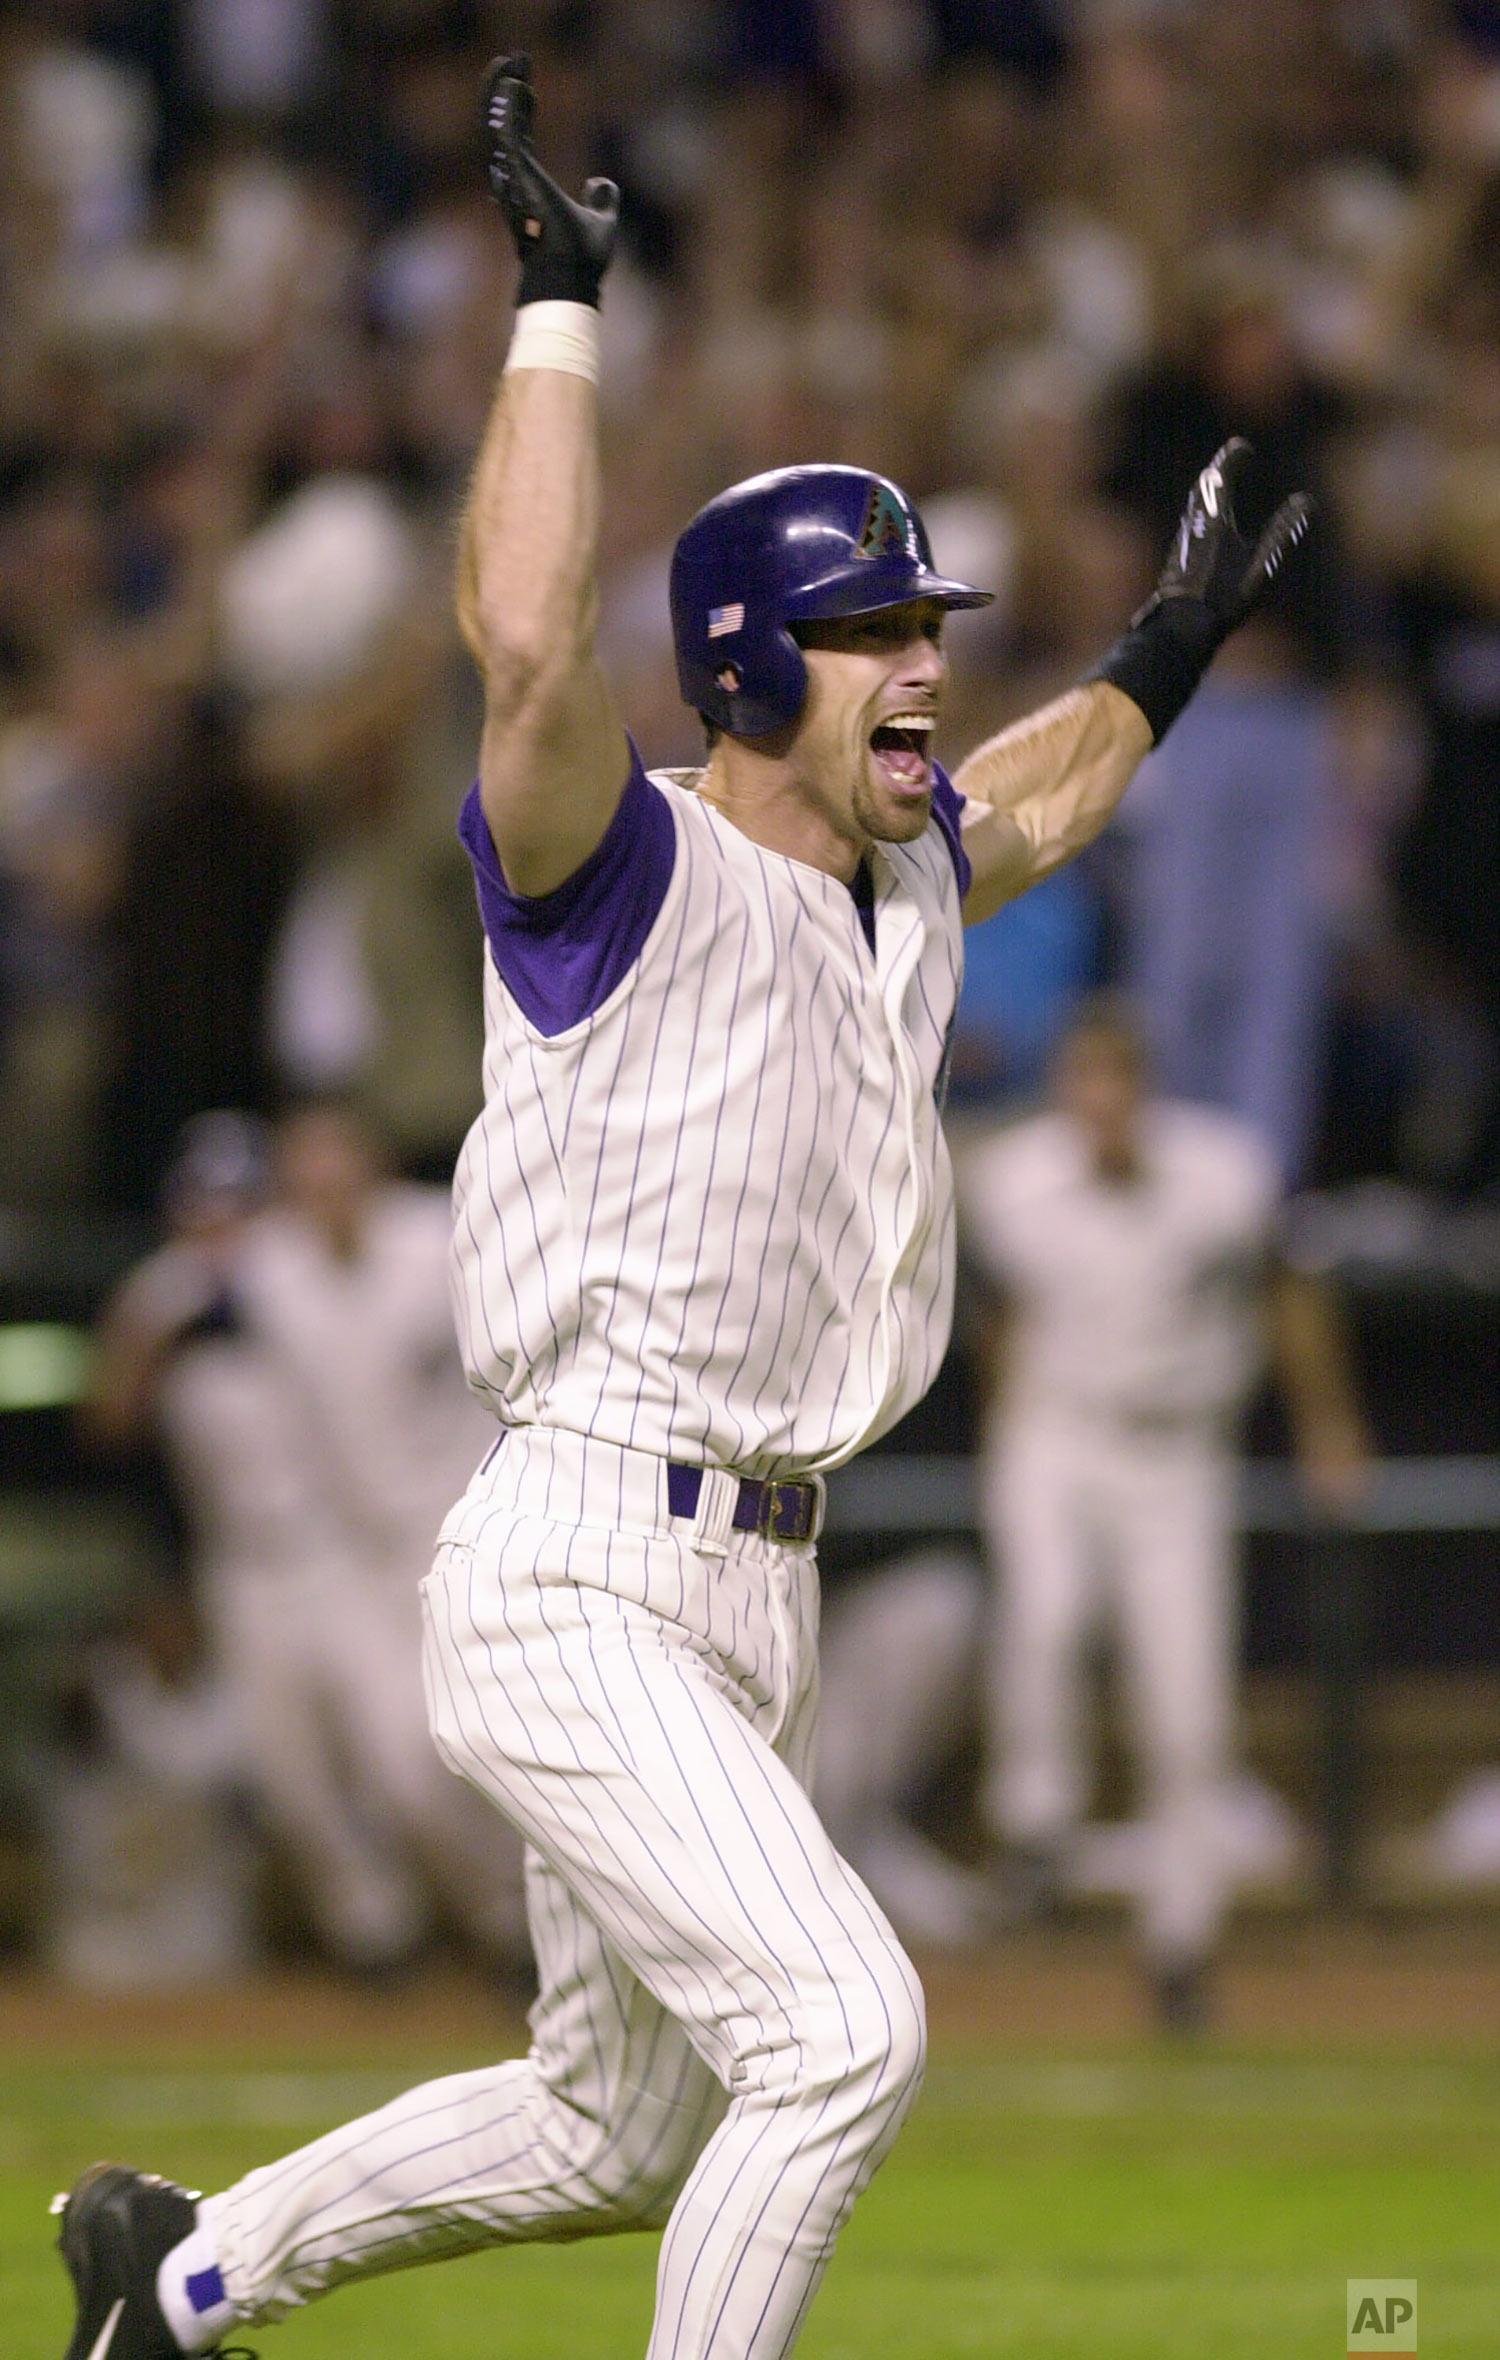 Arizona Diamondbacks' Luis Gonzalez celebrates driving in the winning run in the ninth inning of Game 7 of the World Series against the New York Yankees Sunday, Nov. 4, 2001, at Bank One Ballpark in Phoenix. (AP Photo/John Bazemore)